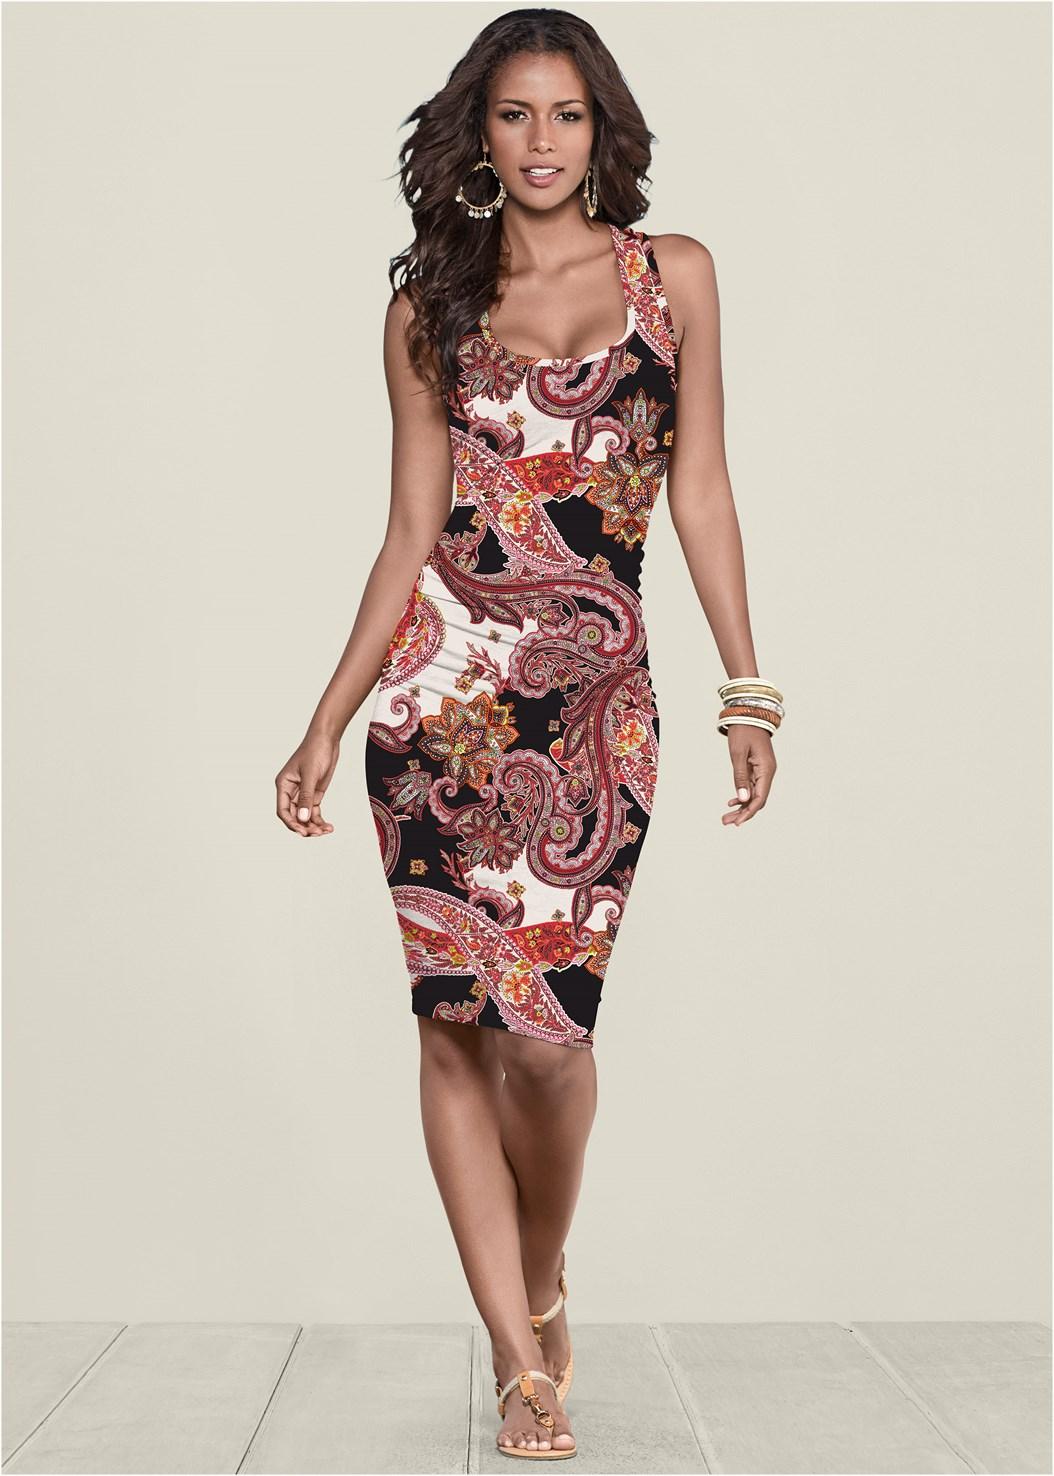 Ruched Print Tank Dress,Seamless Unlined Bra,Sleeveless Ruched Bodycon Midi Dress,Rhinestone Thong Sandal,Tassel Hoop Earrings,Hoop Earrings,Animal Print Bangle Set